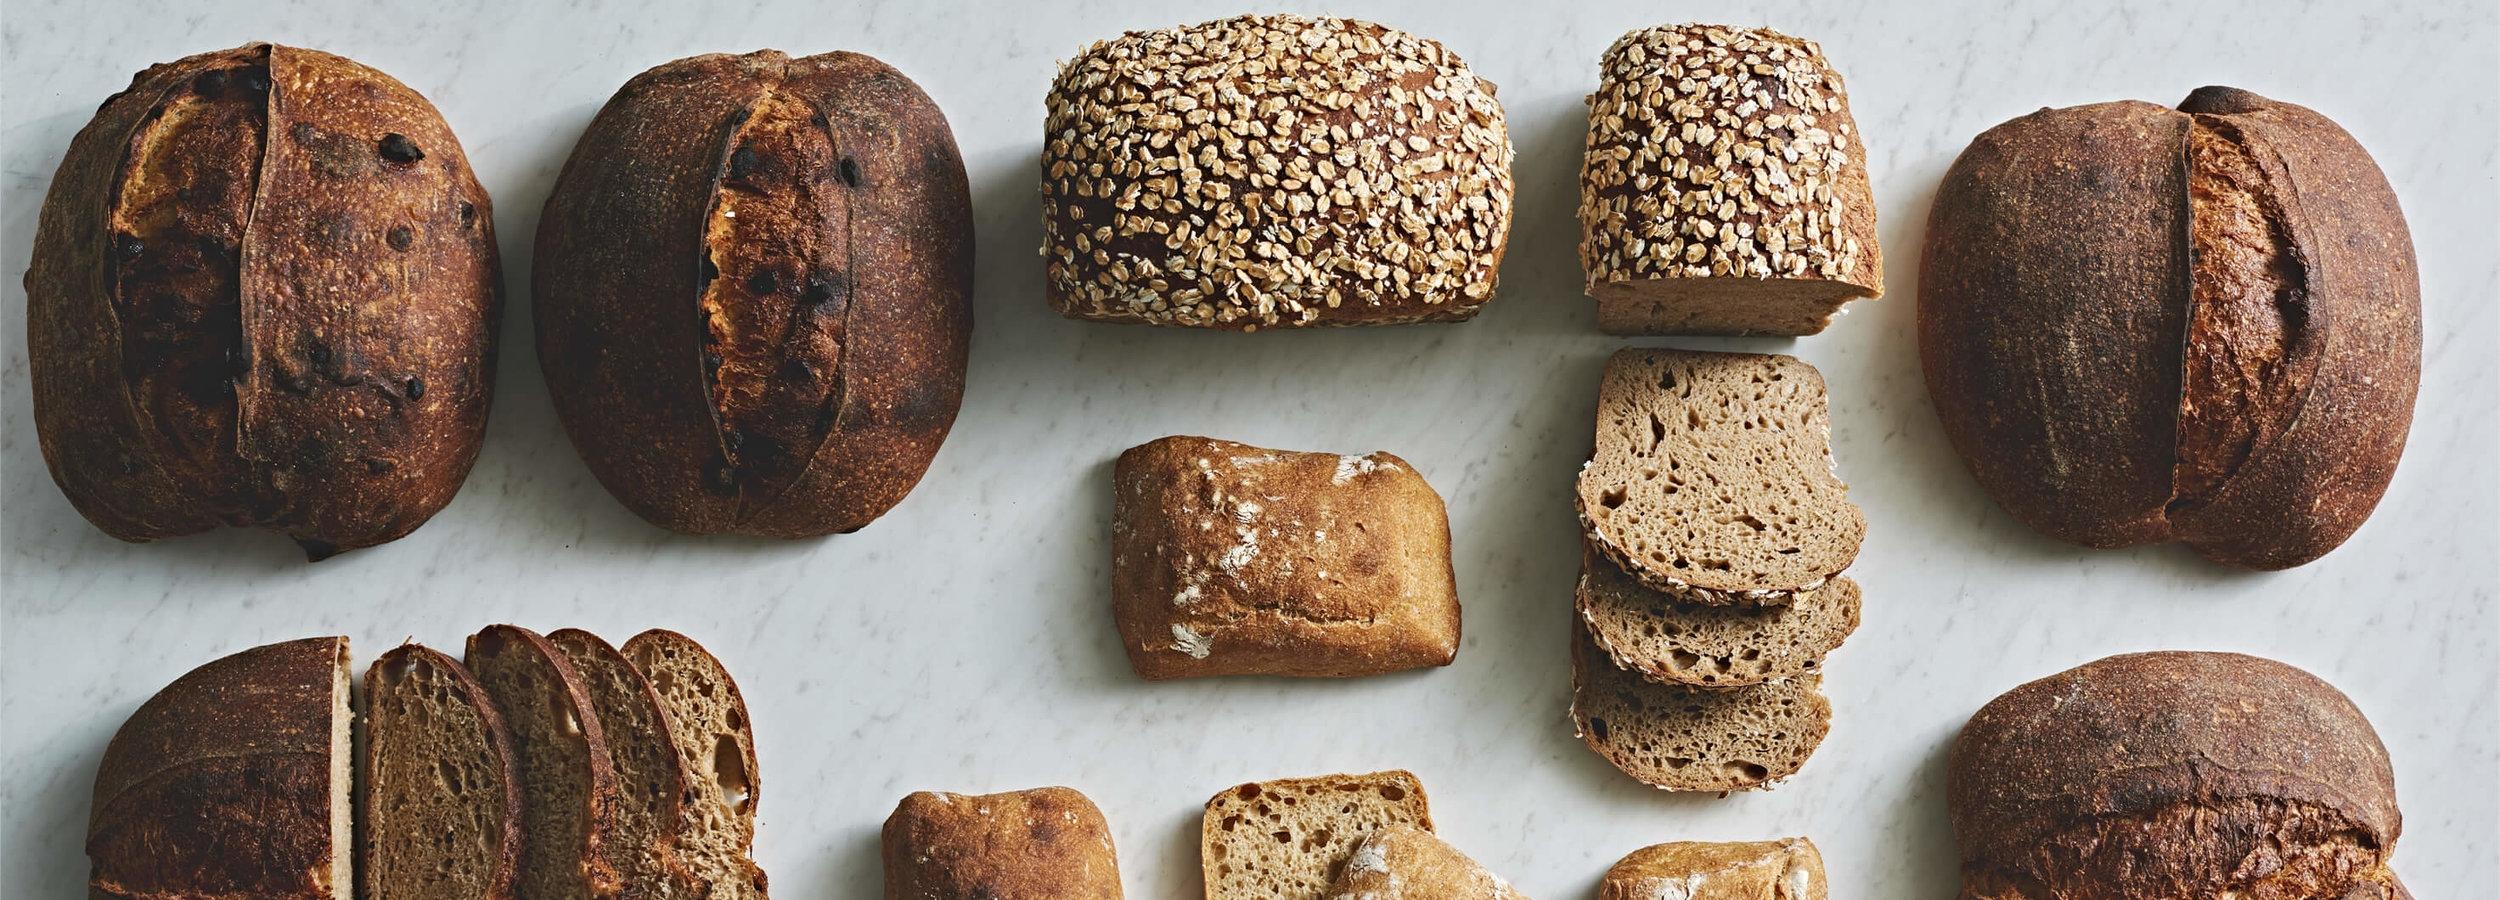 wyld bread assortment.jpg